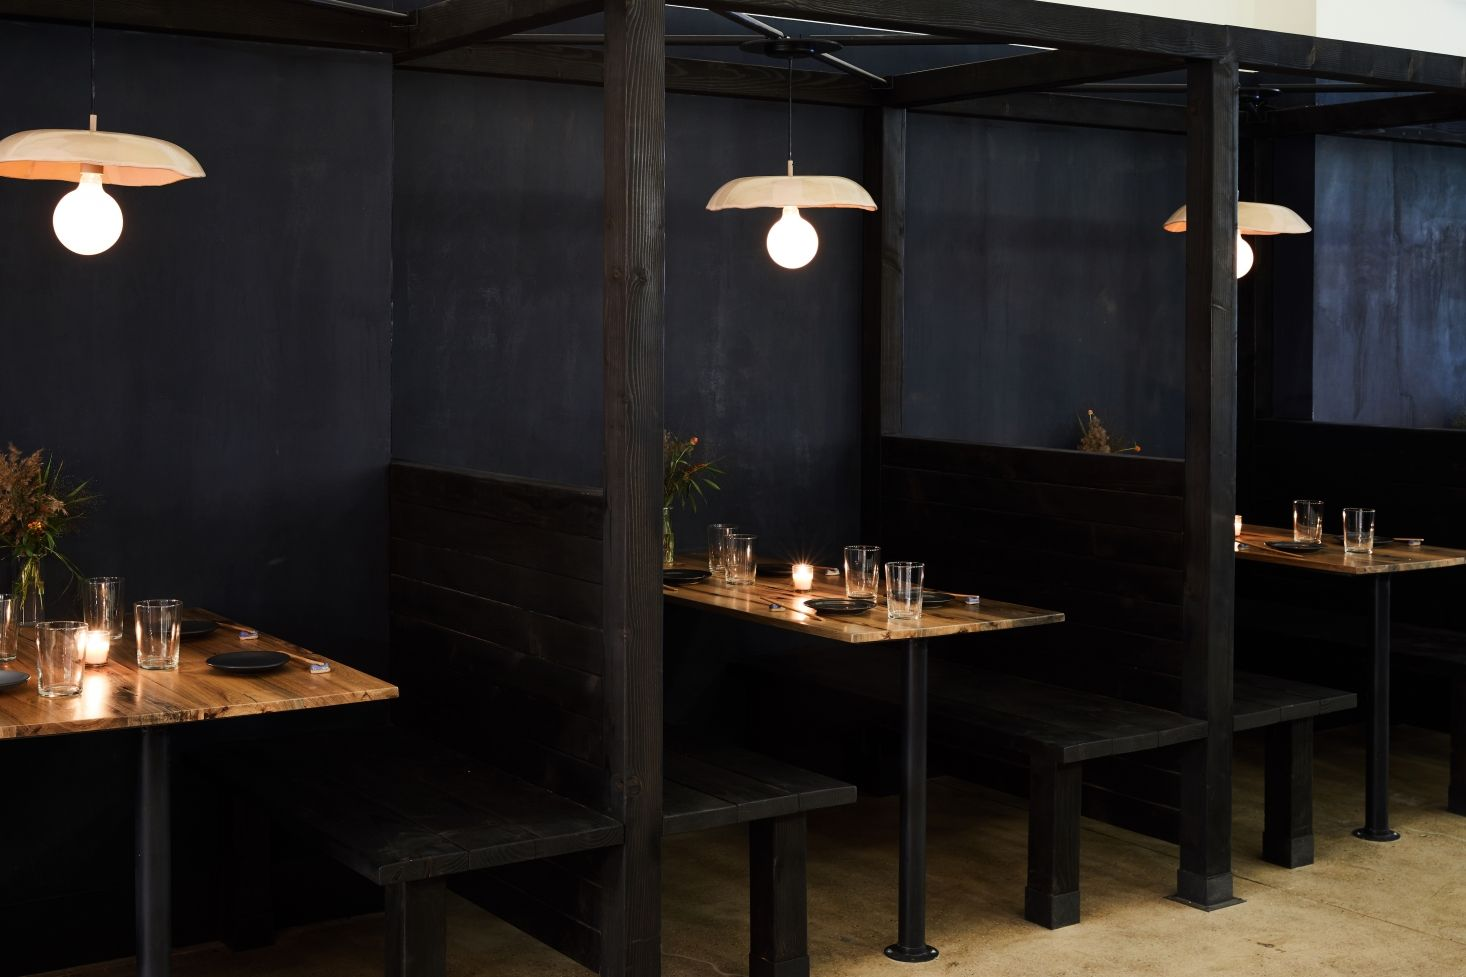 9 Design Ideas For Small Dark Rooms From Tonchin New York Small Restaurant Design Bar Design Restaurant Cafe Interior Design